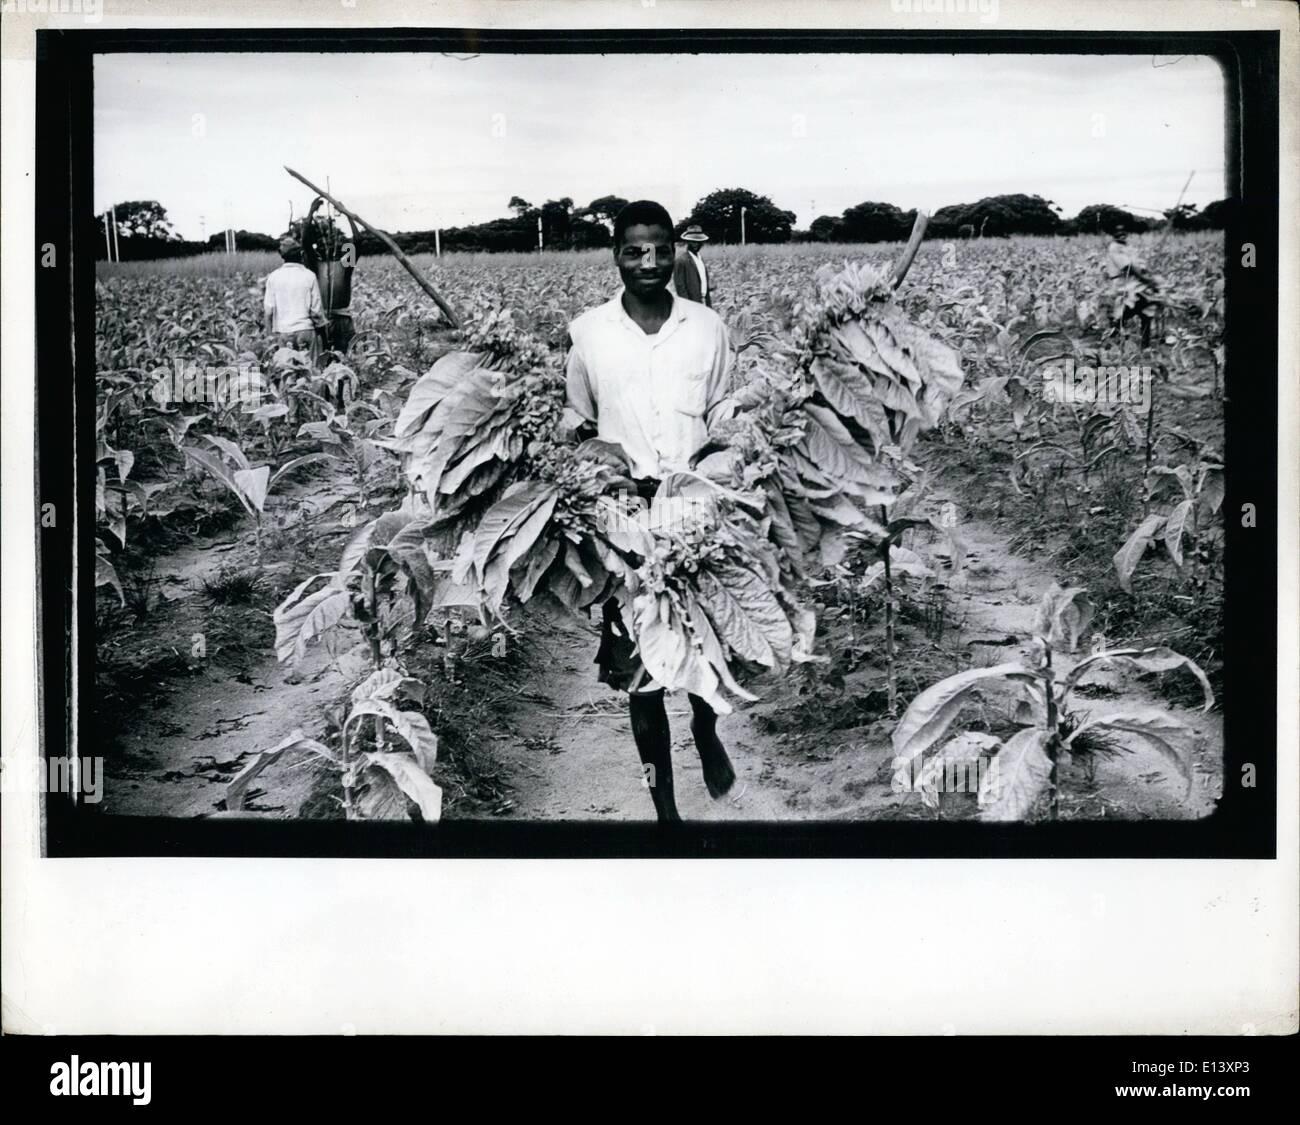 Mar. 27, 2012 - Rhodesia: Tobacco plantation. - Stock Image